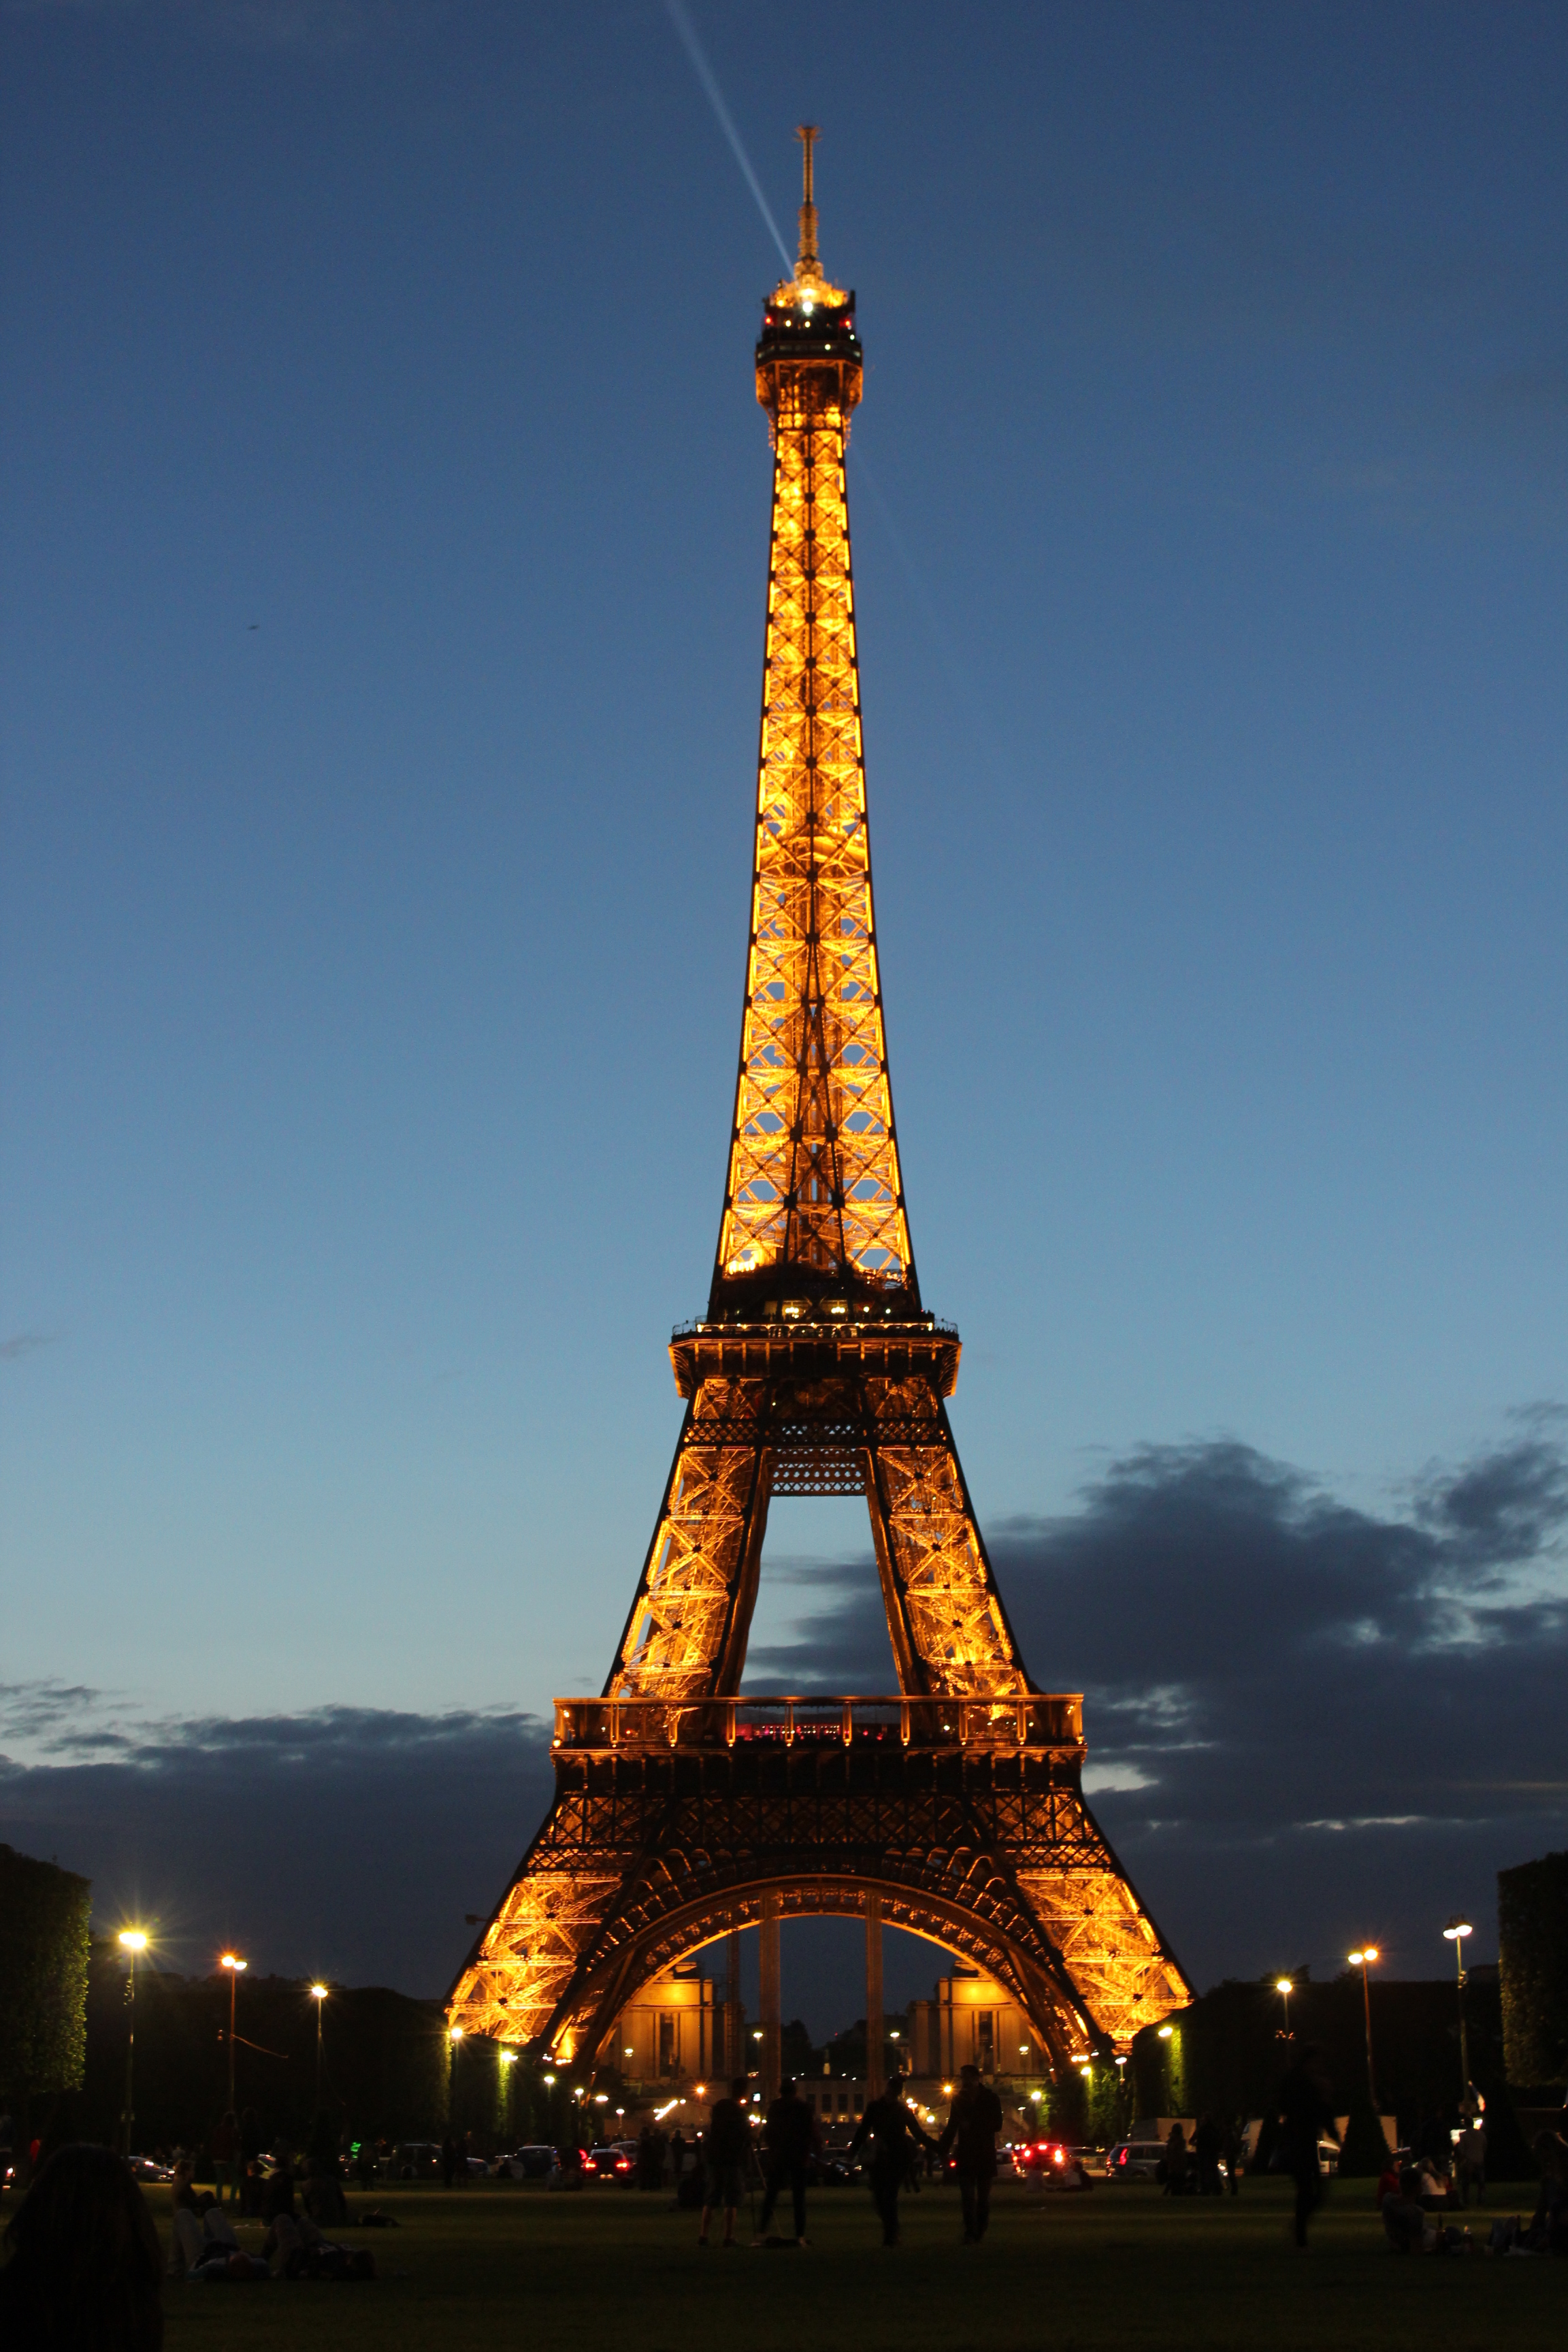 eiffel tower - photo #13